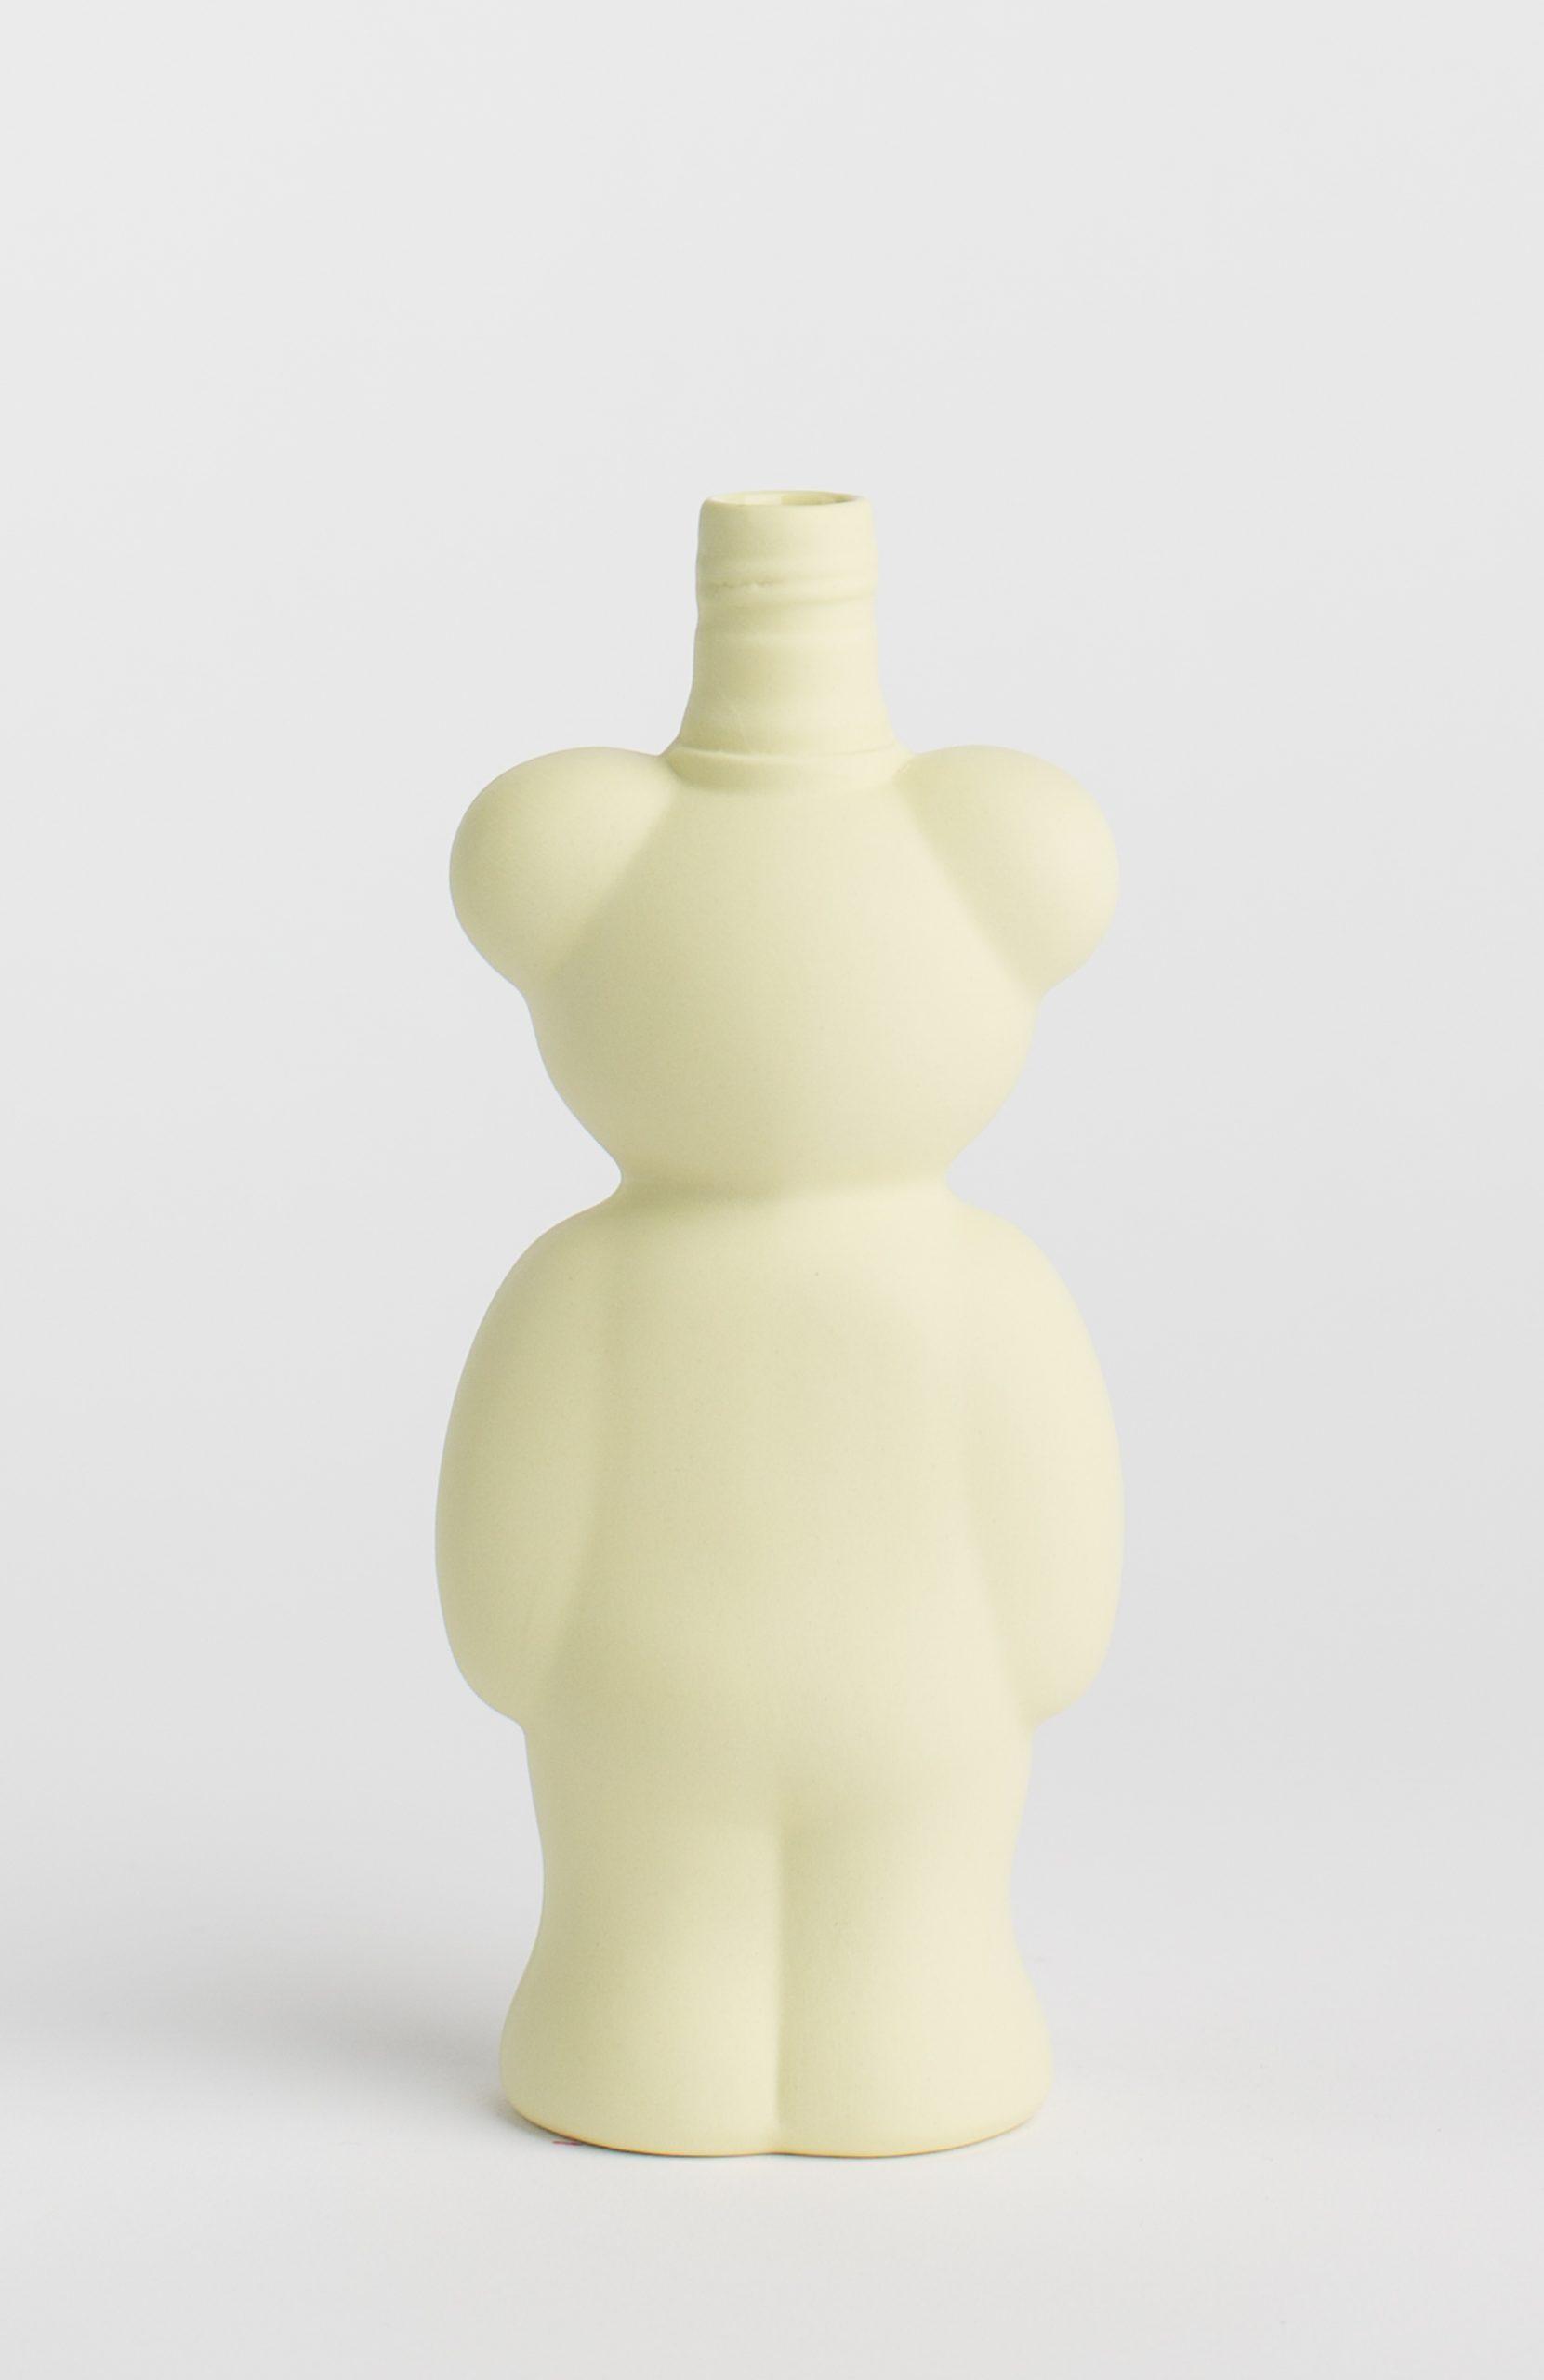 bottle vase #101 limited edition post-it